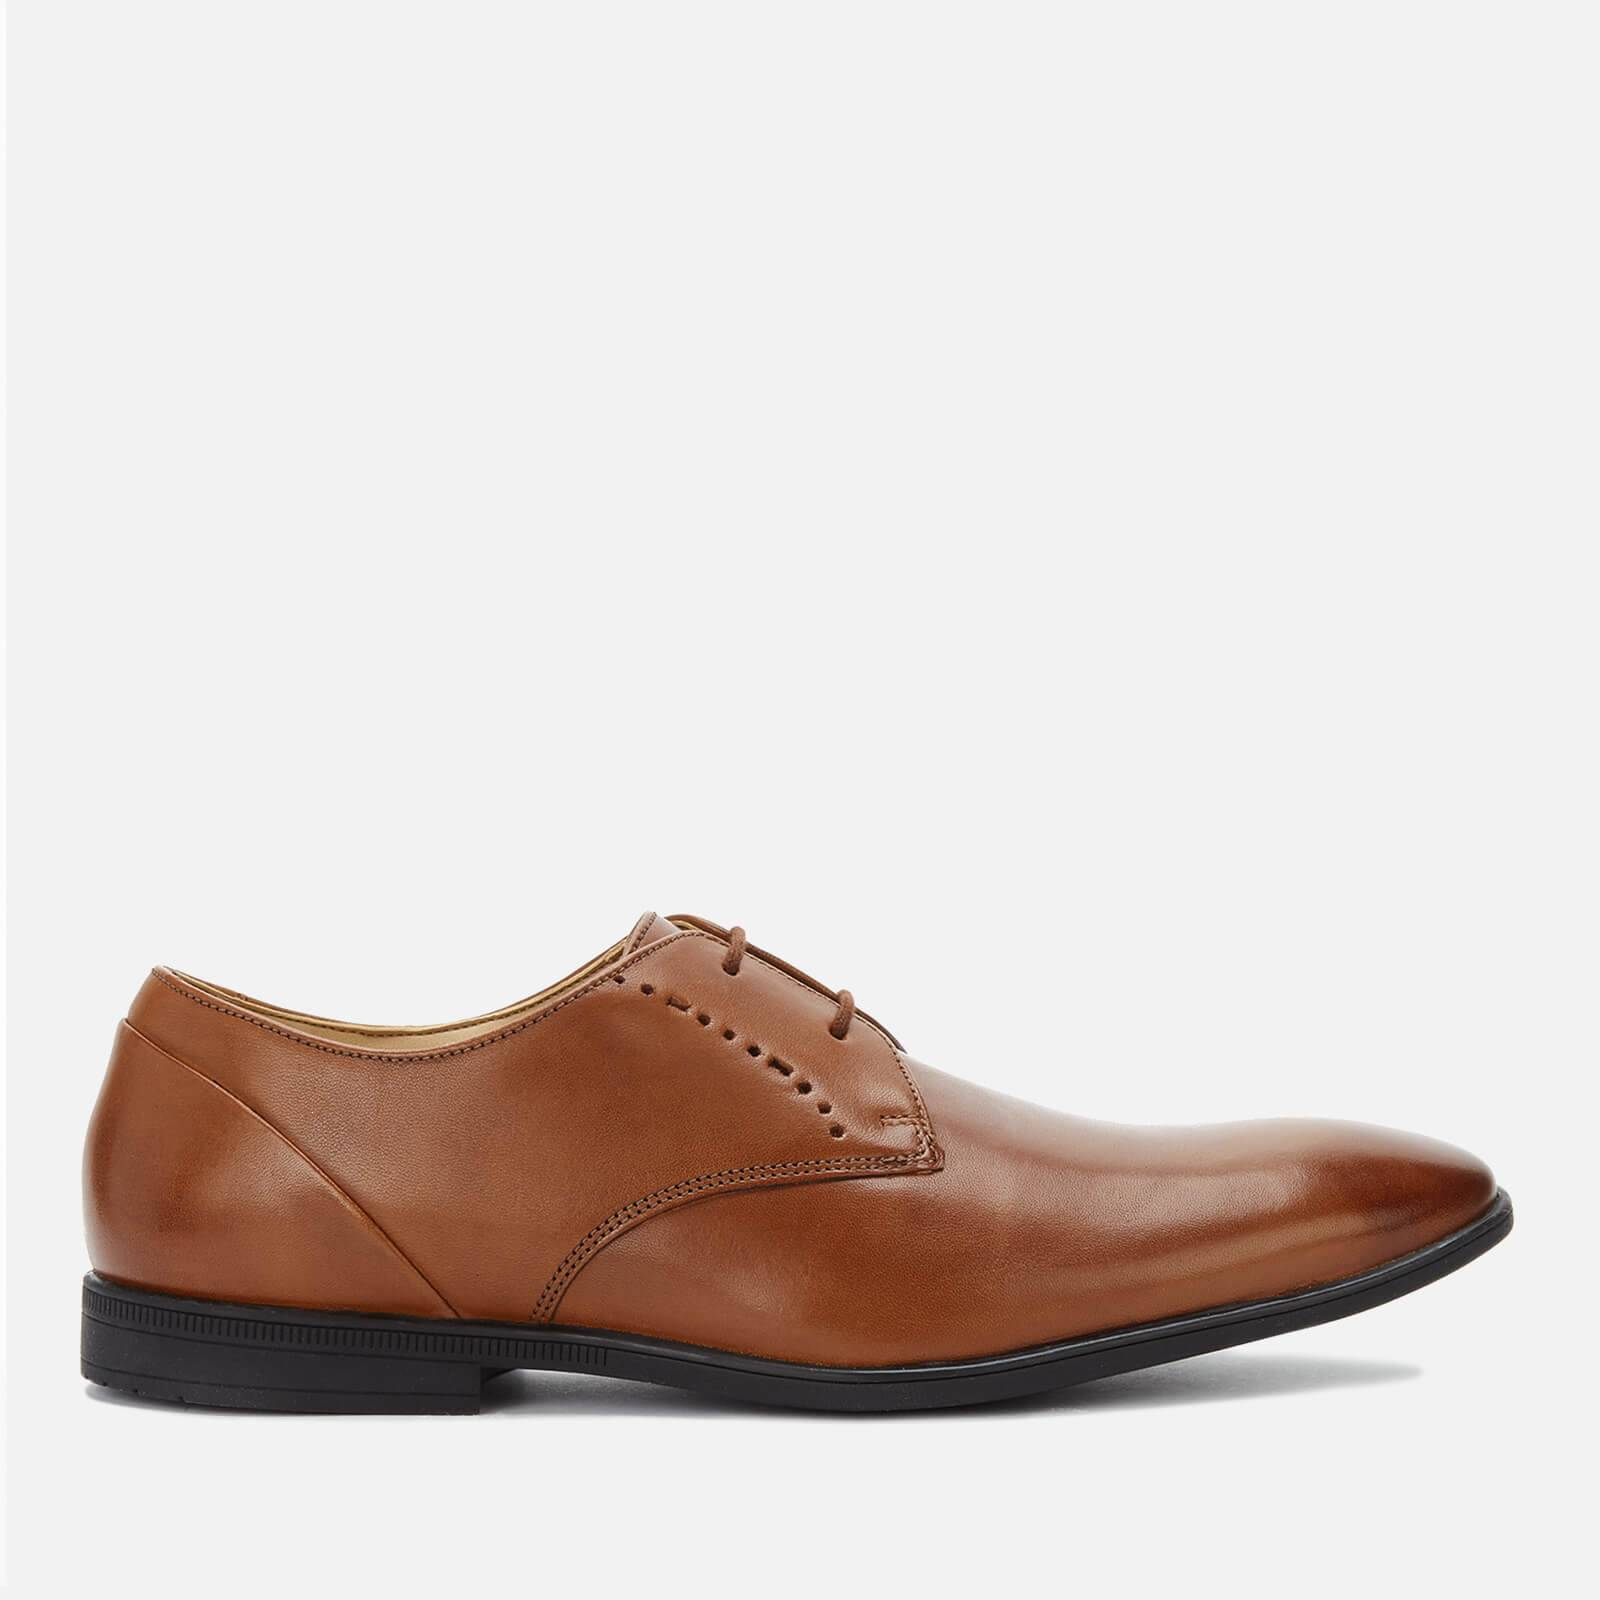 Clarks Men's Bampton Lace Leather Derby Shoes - Tan - UK 10